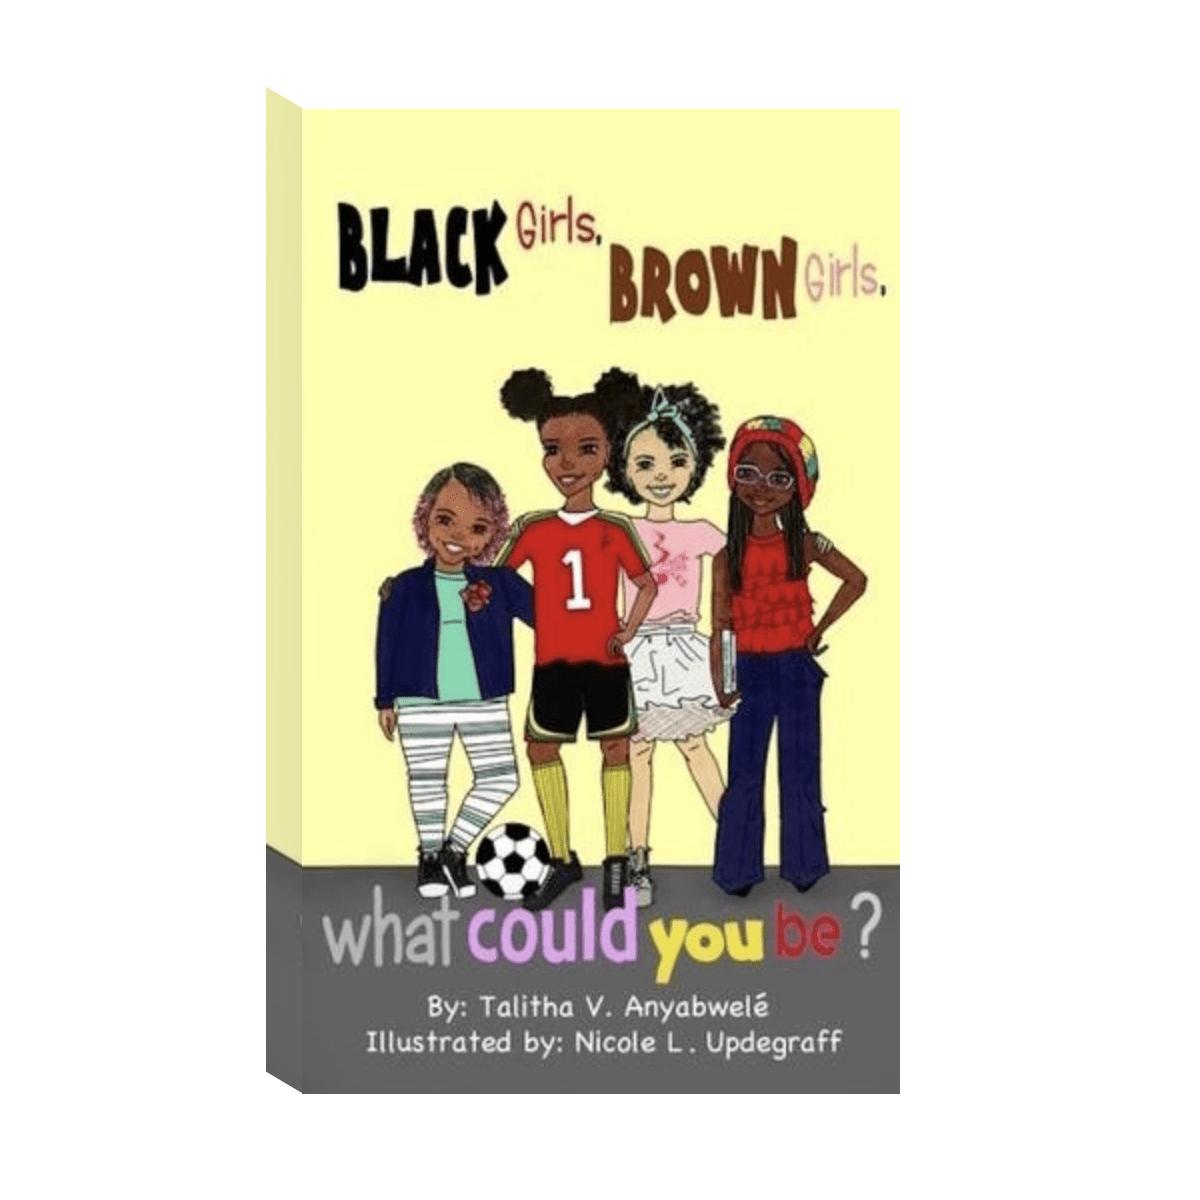 Black Girls, Brown Girls